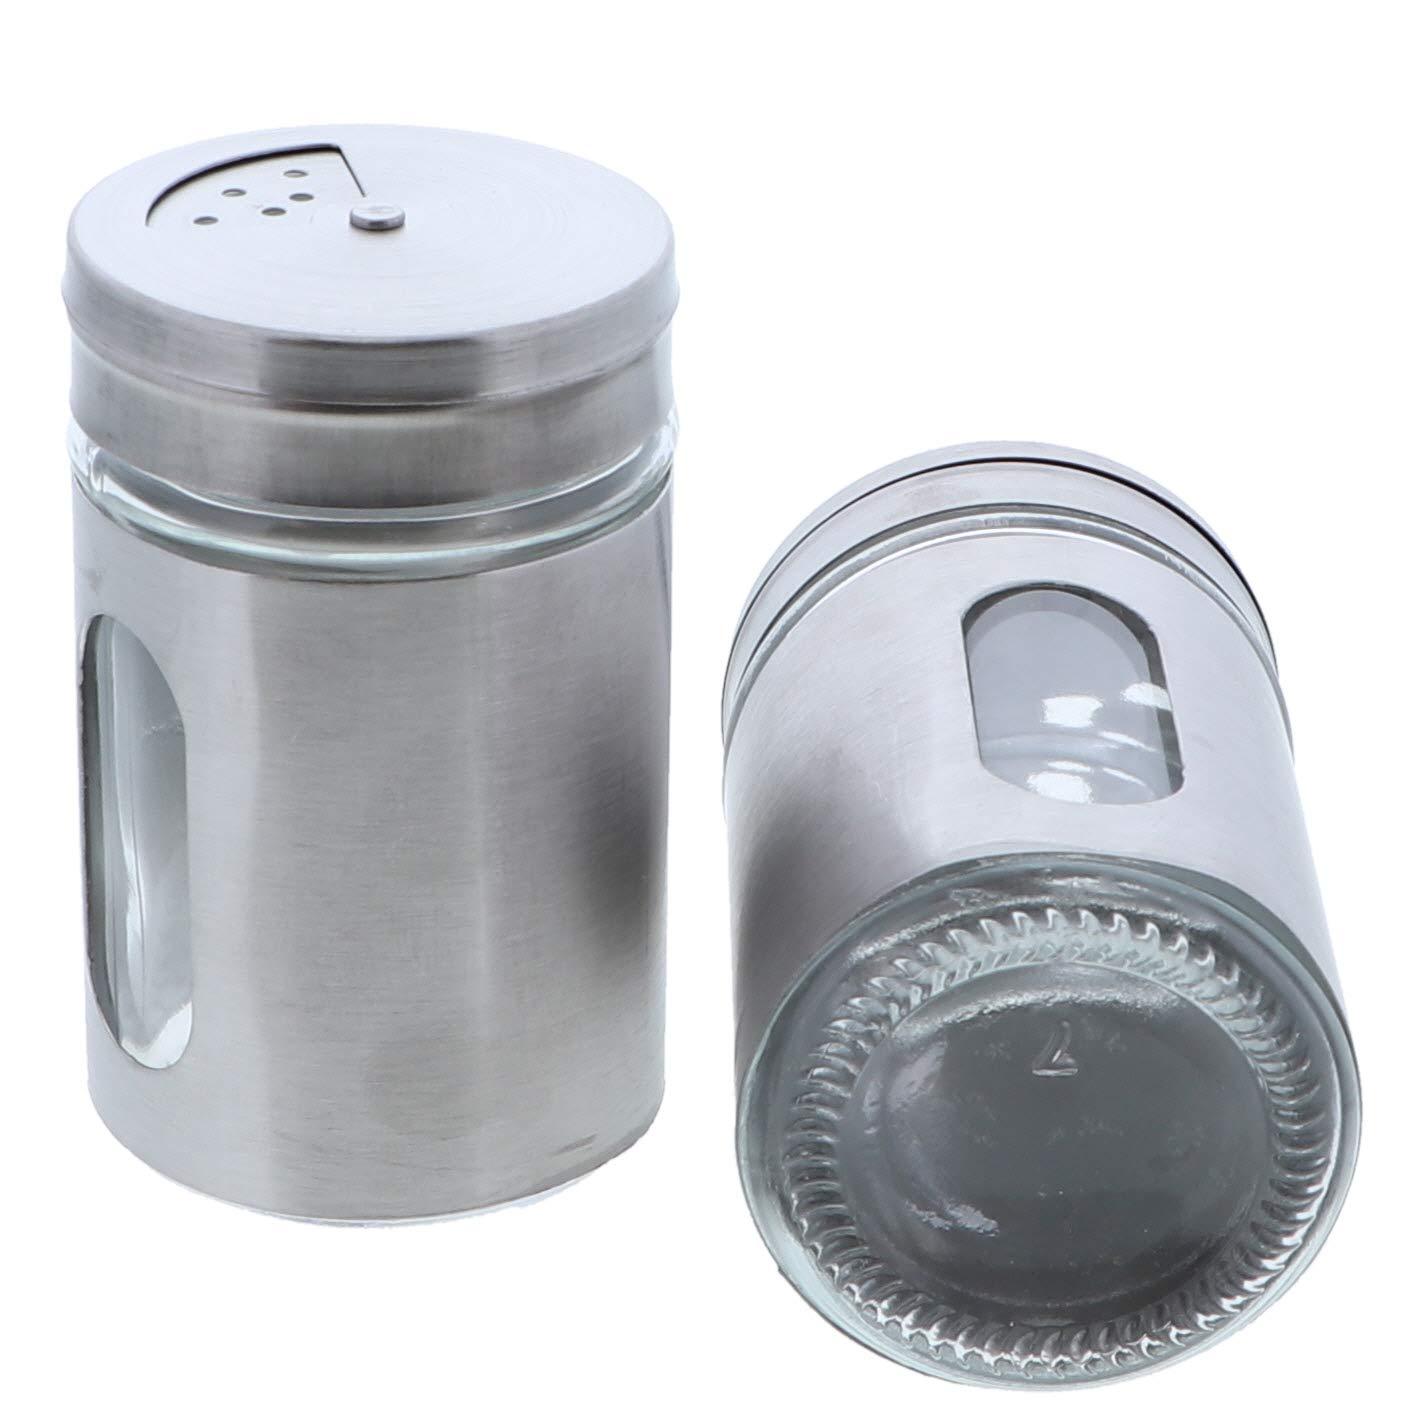 Green Salt Pepper Shakers Retro Spice Jars Glass Set of 2